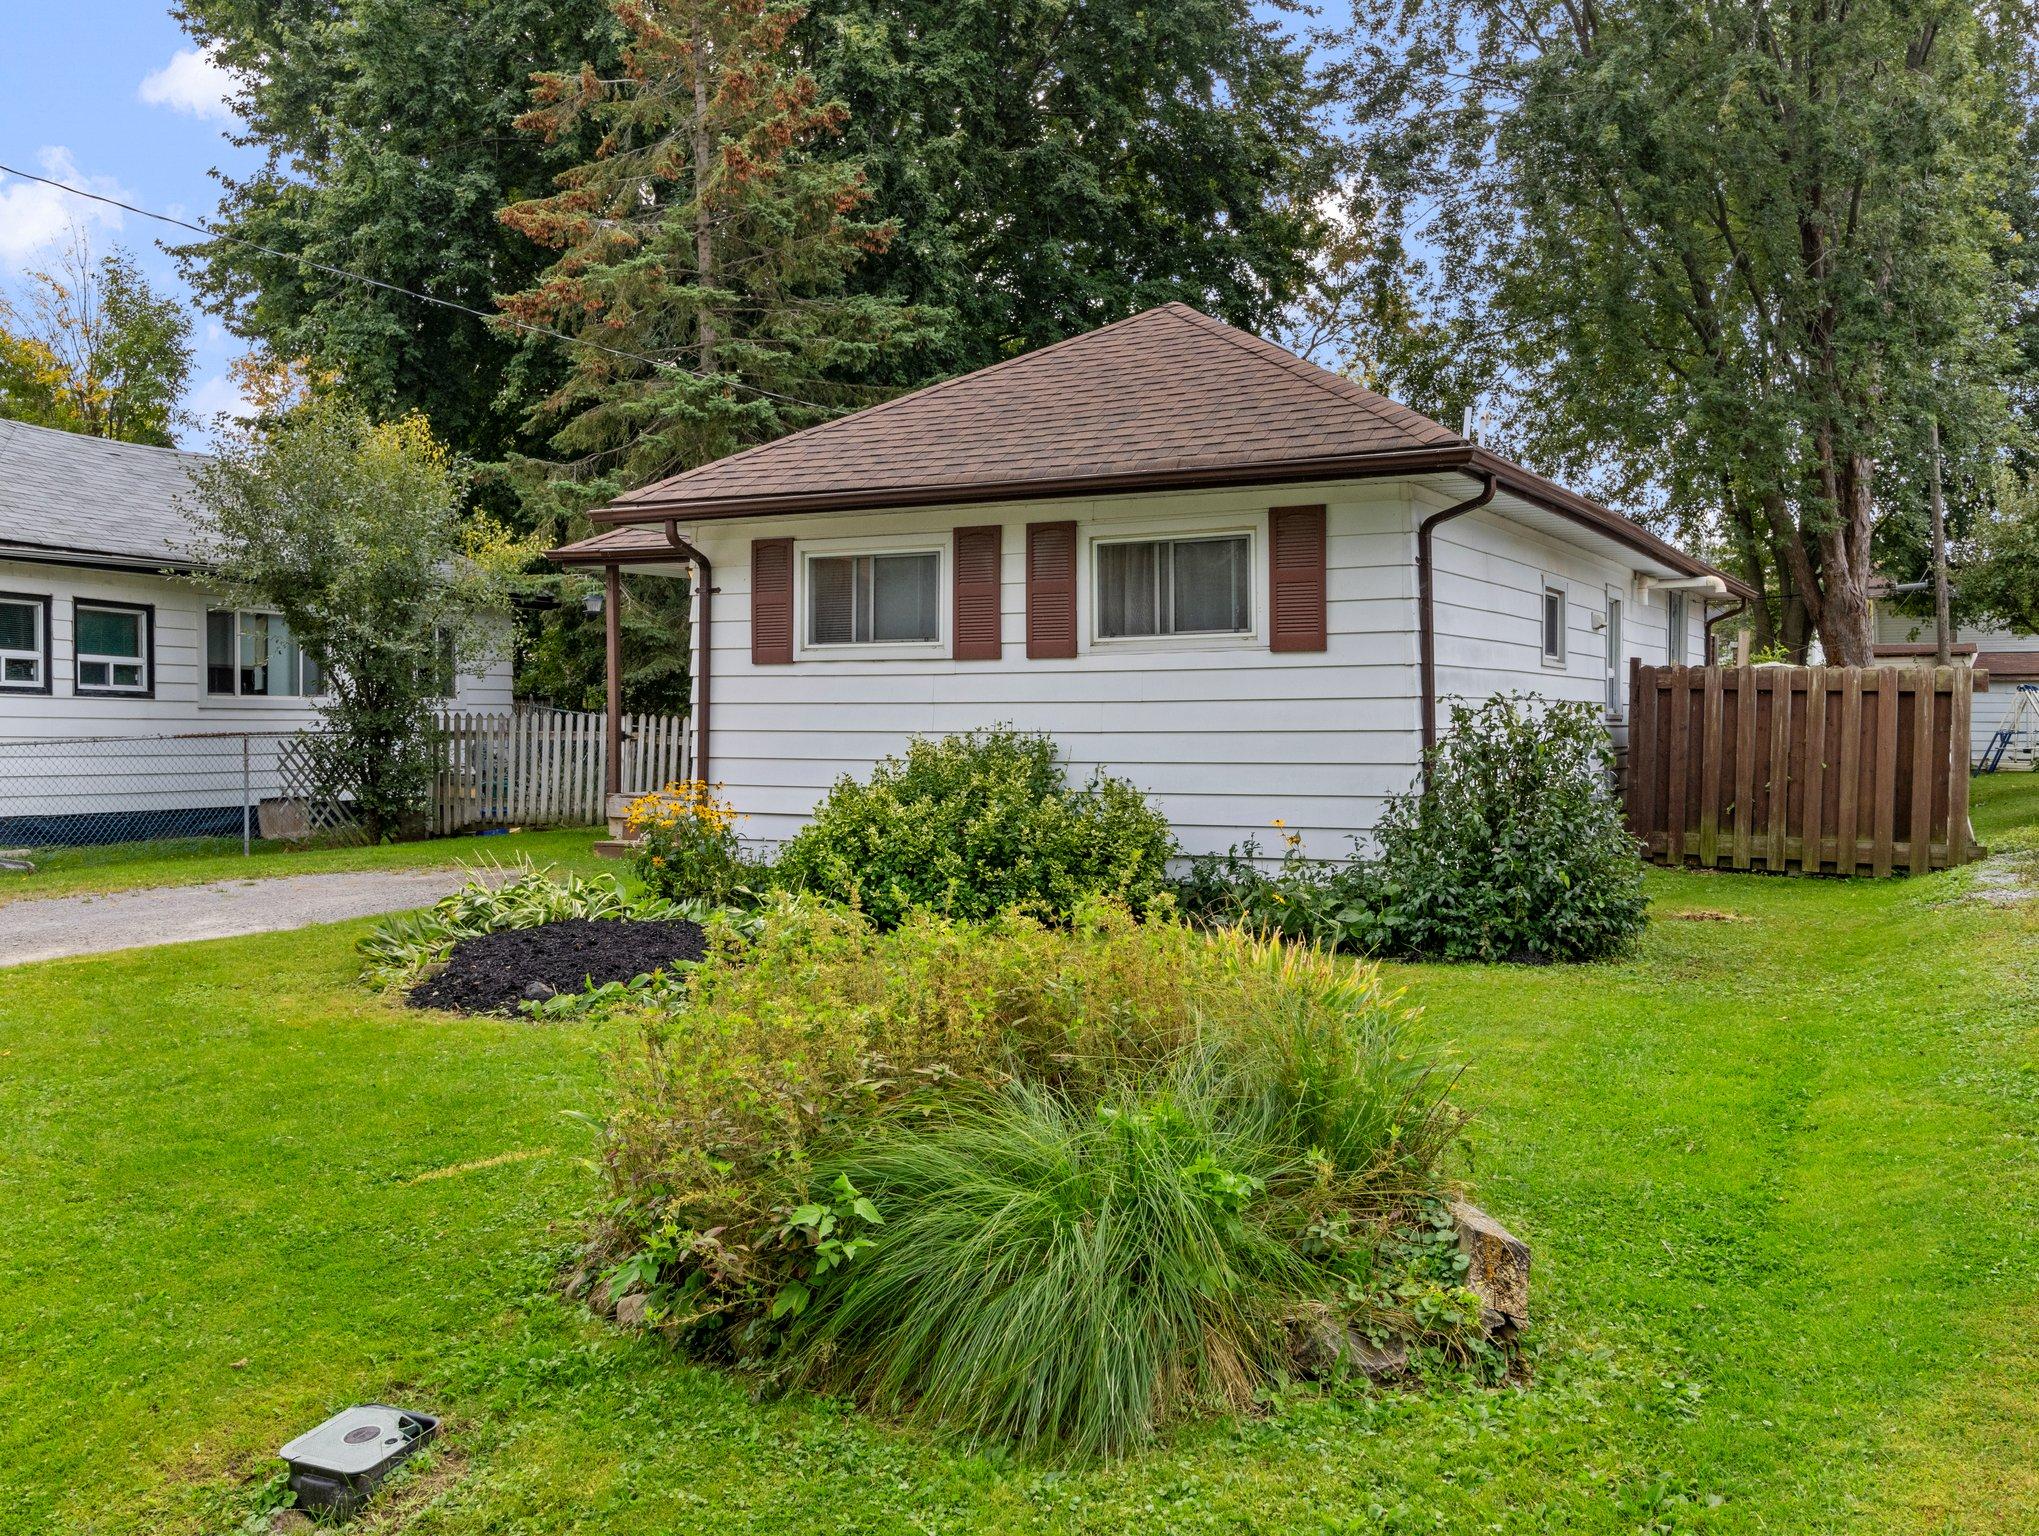 307 Parkwood Ave, Keswick, ON L4P 2X4, Canada Photo 2